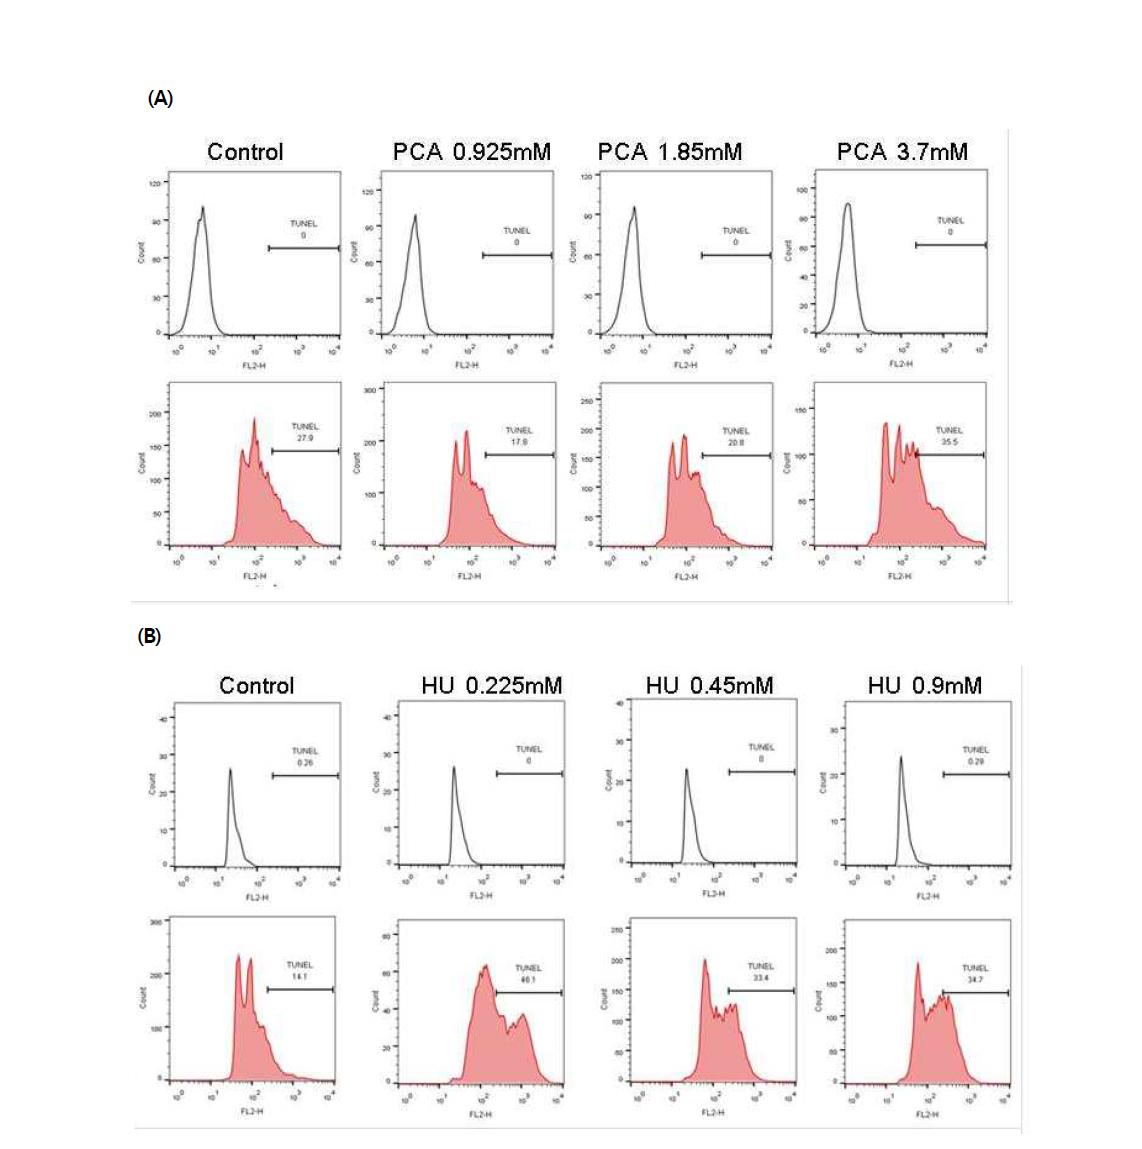 TUNEL assay를 이용한 시험 물질에 대한 수컷 생식줄기세포 독성